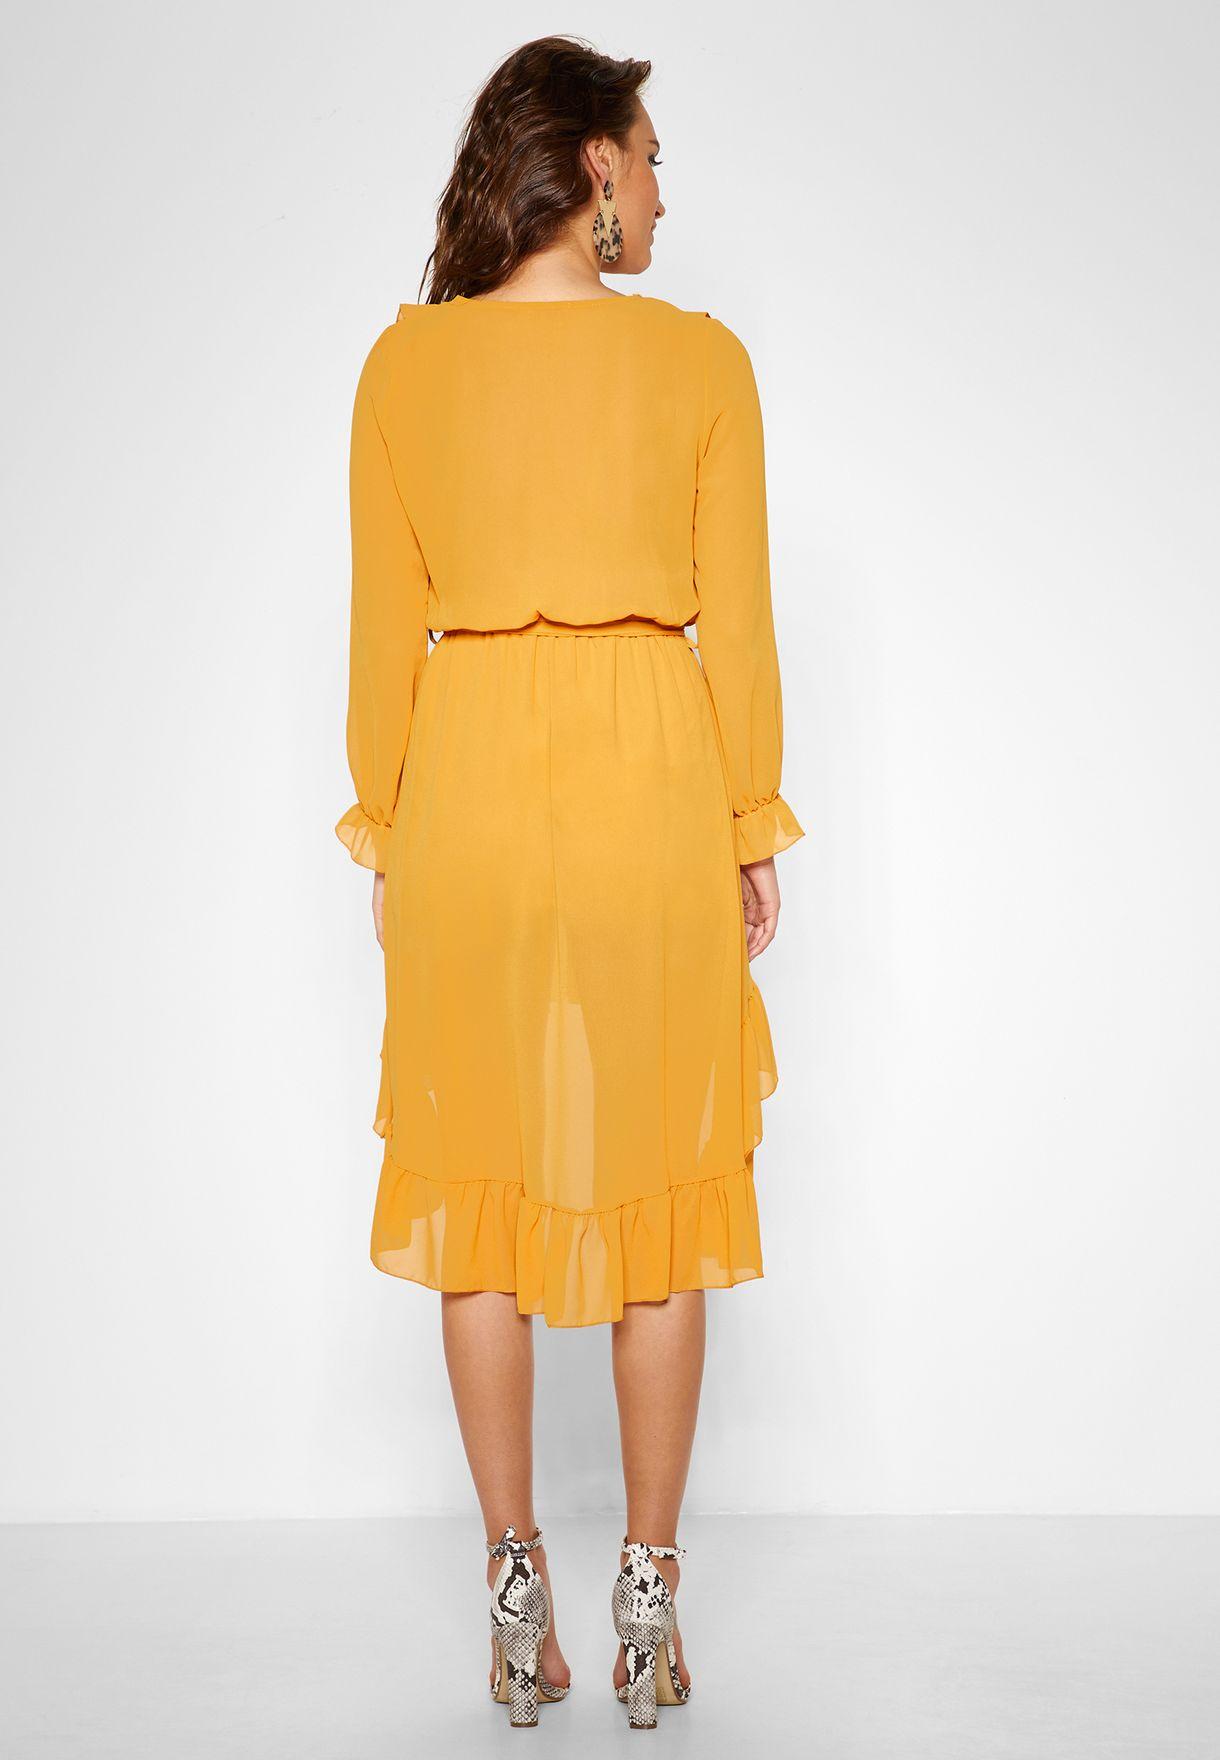 Ruffle Trim Self Tie Midi Dress